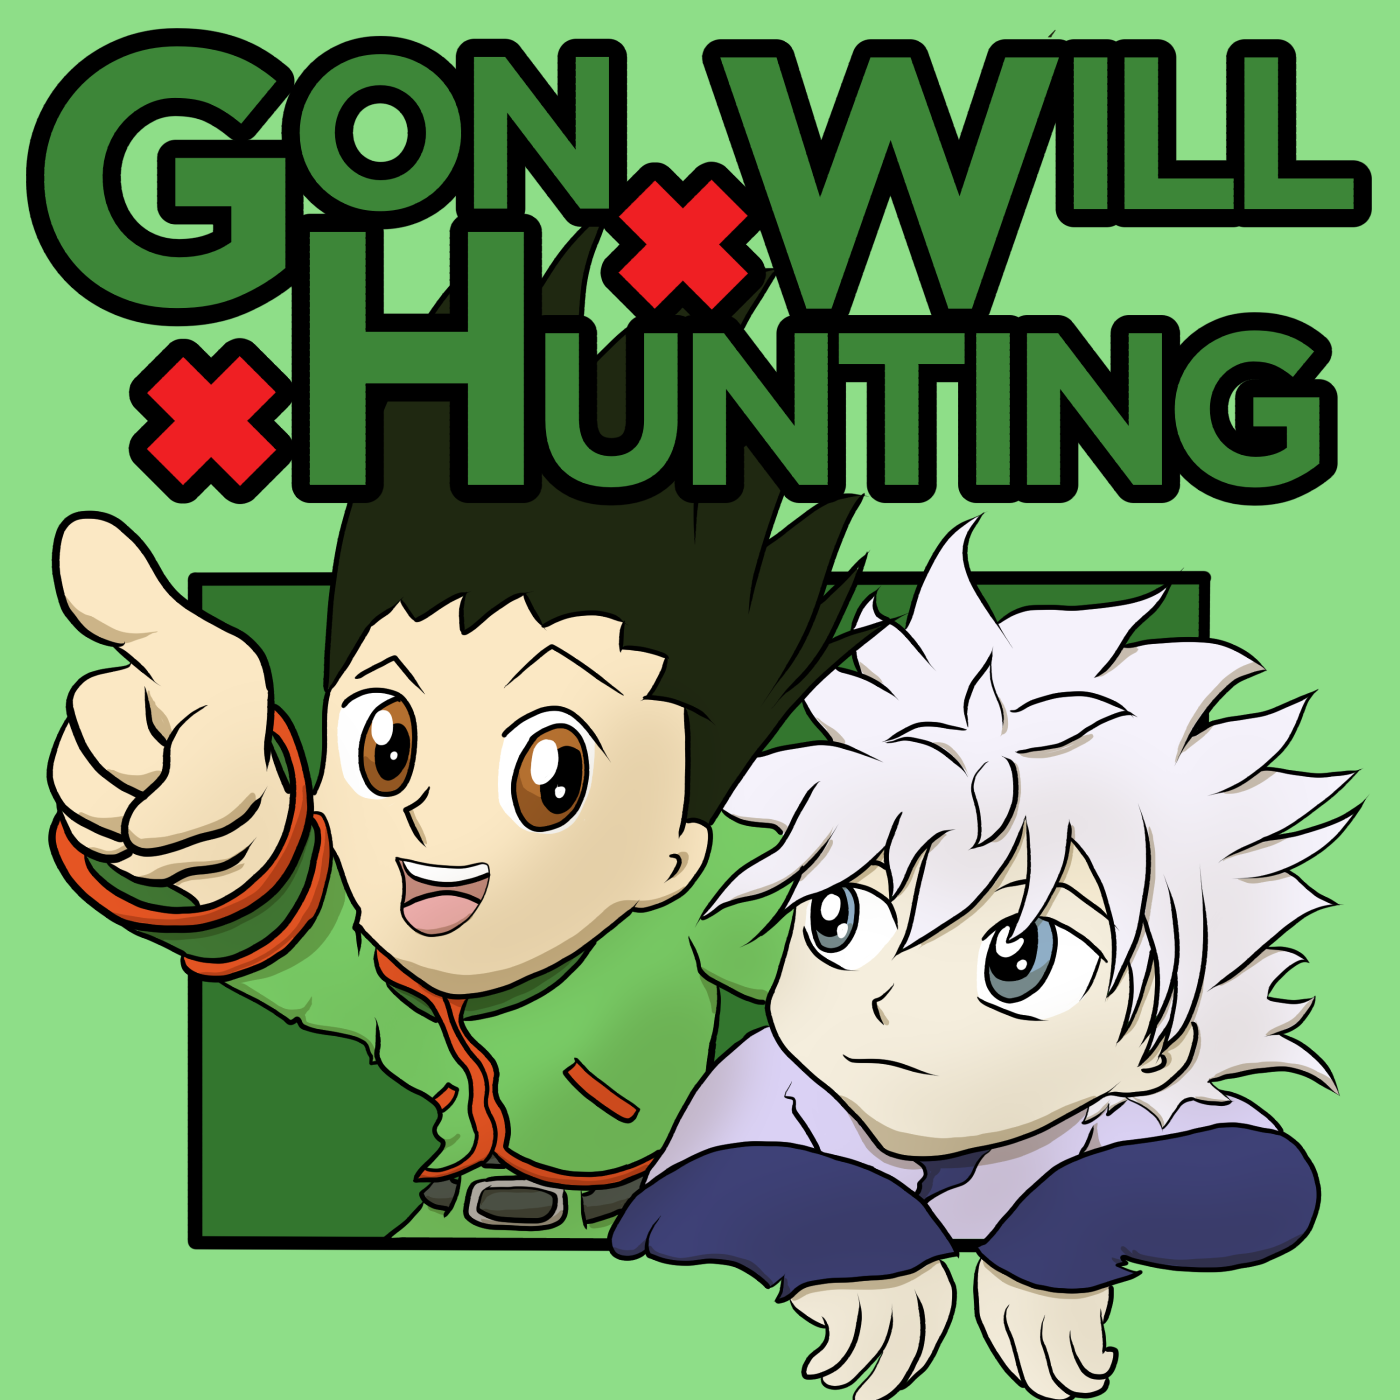 Gon x Will x Hunting: A Hunter x Hunter Anime Rewatch